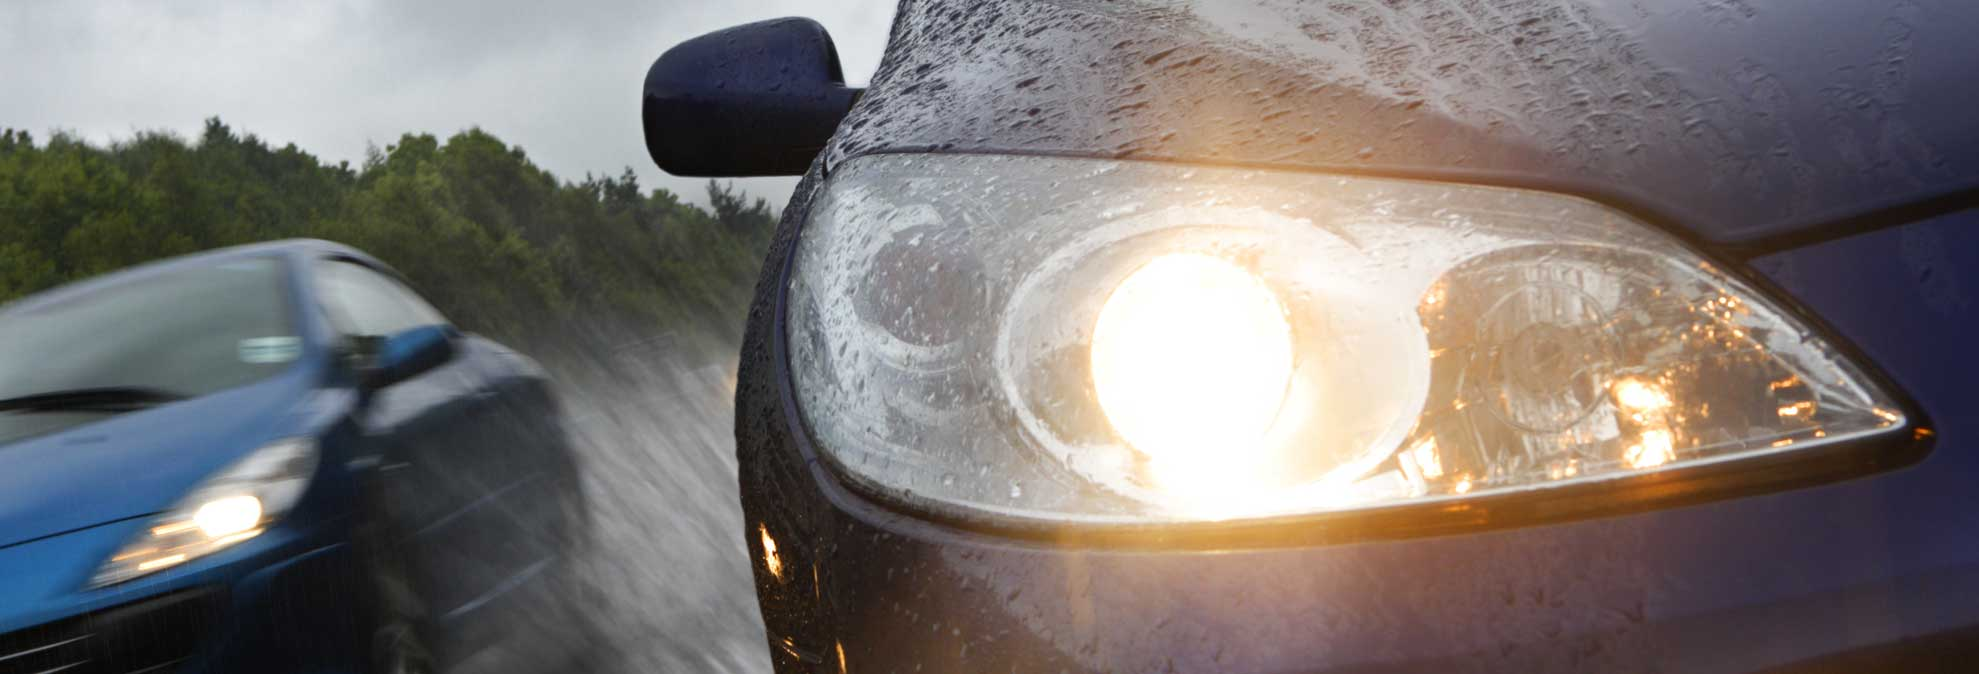 Starting a Headlight Restoration Service – Sample Business Plan Template